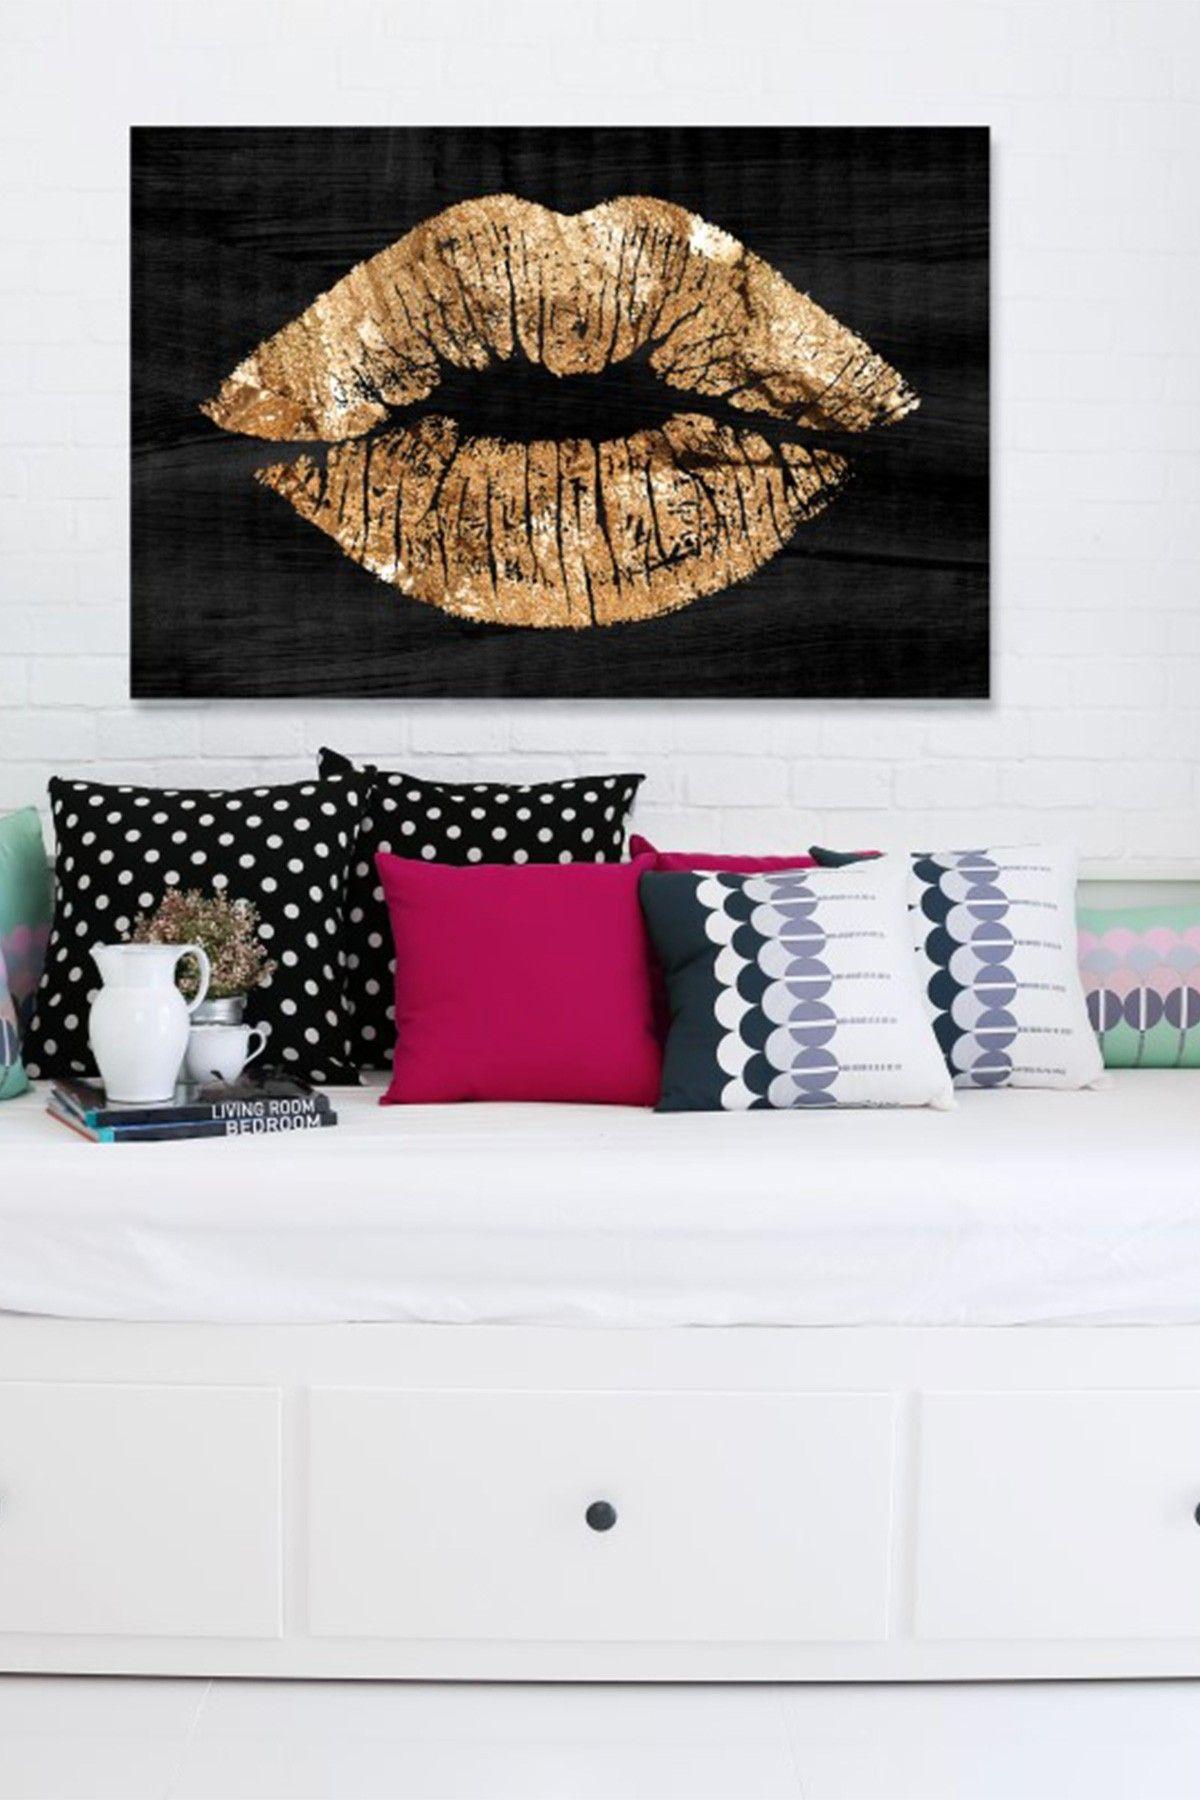 Diy bedroom ideas for girls or boys furniture bedroom ideas